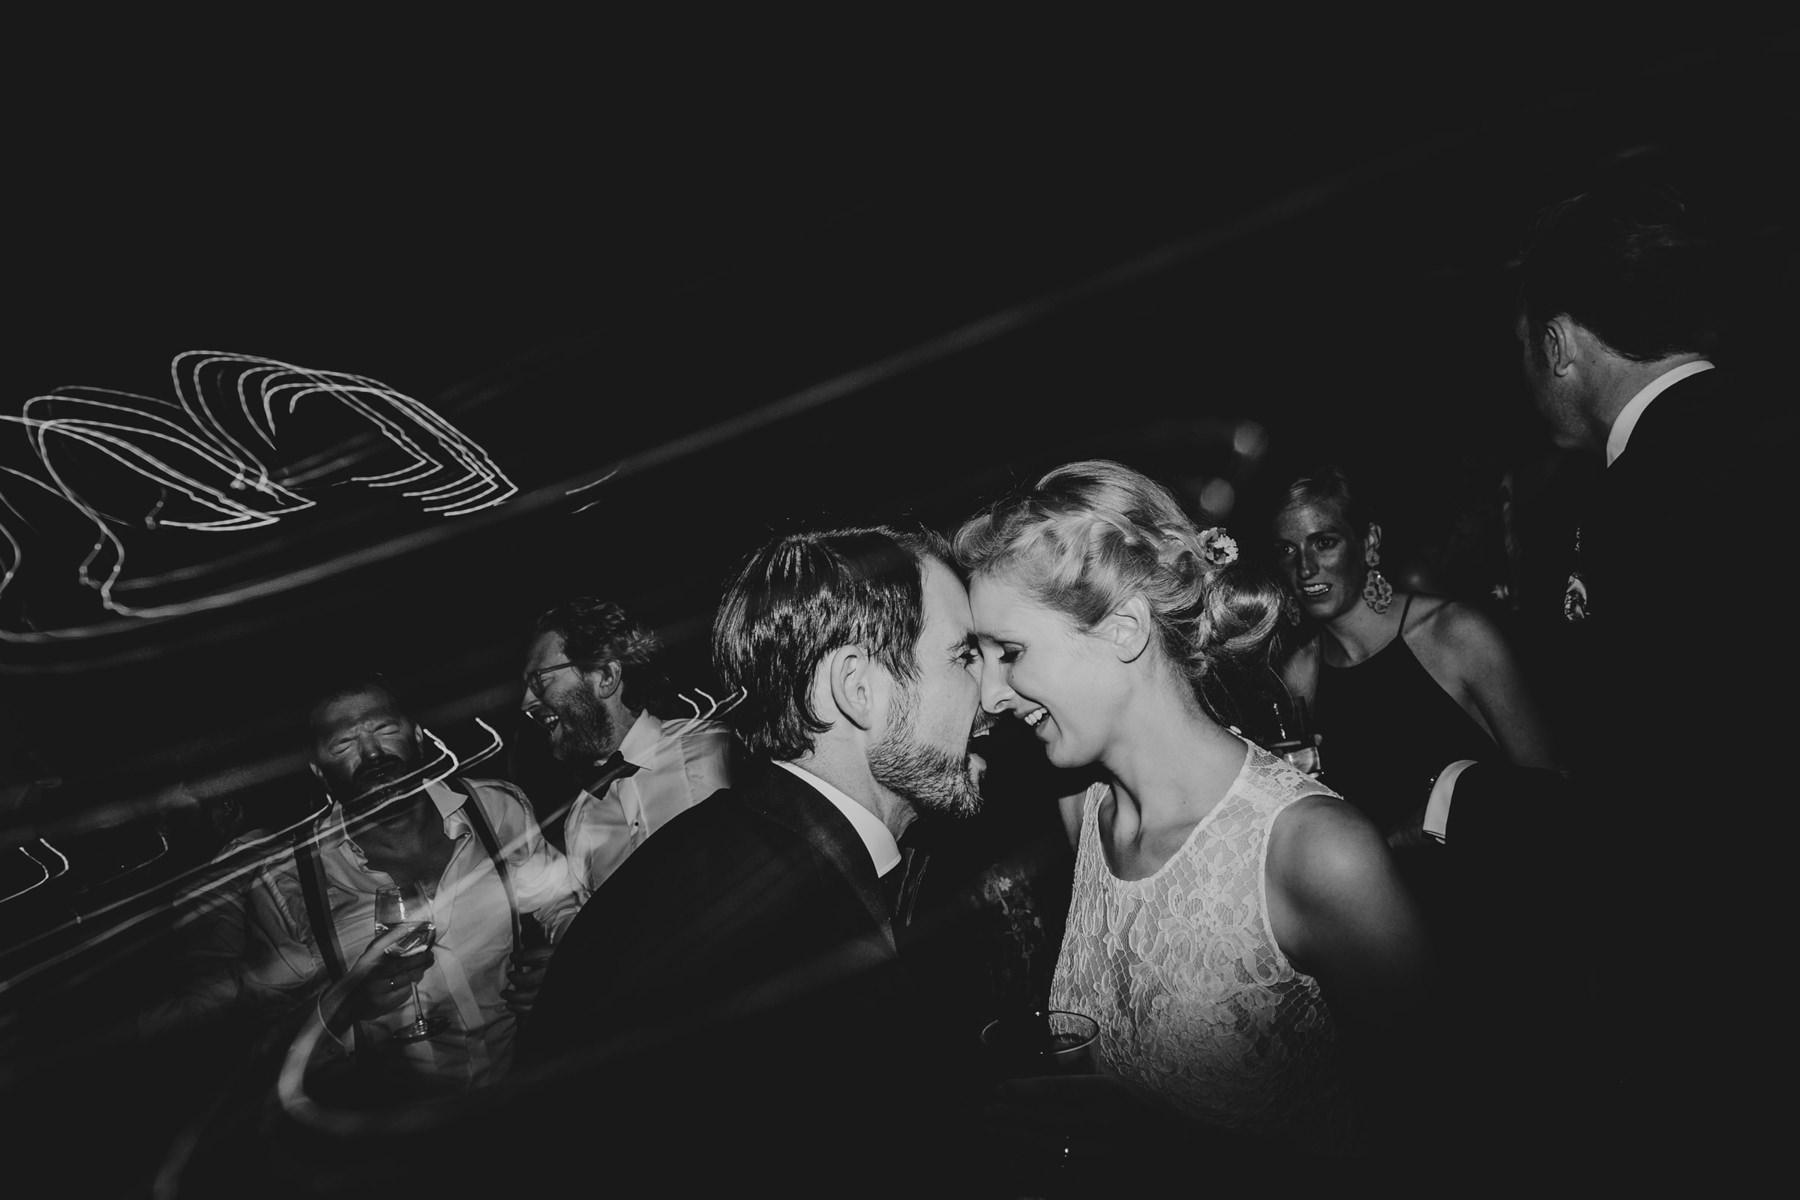 Wedding_Photography_Carlos_Hevia_Barcelona_Berlin_59.jpg